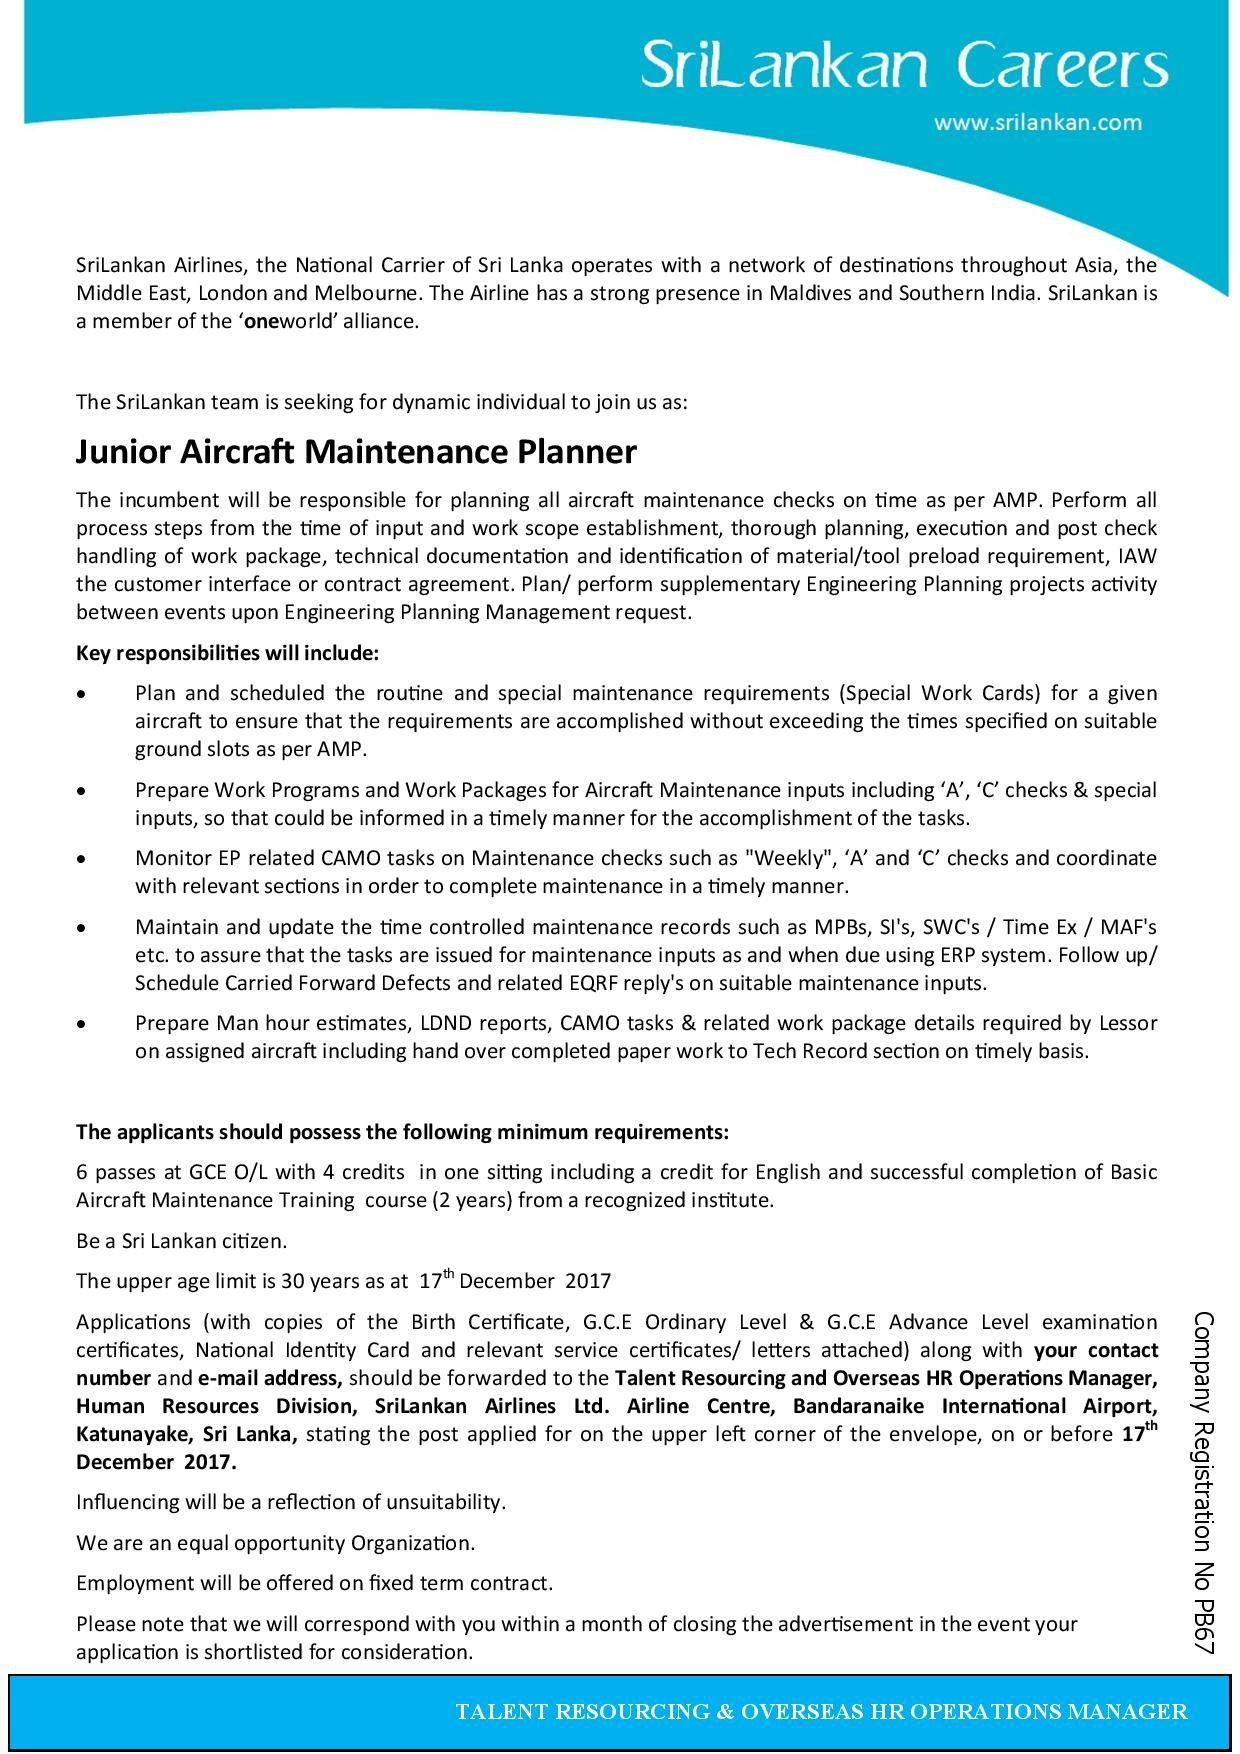 Aircraft Maintenance Planner Jobs In Uae Aircraft Maintenance Maintenance Jobs Aircraft